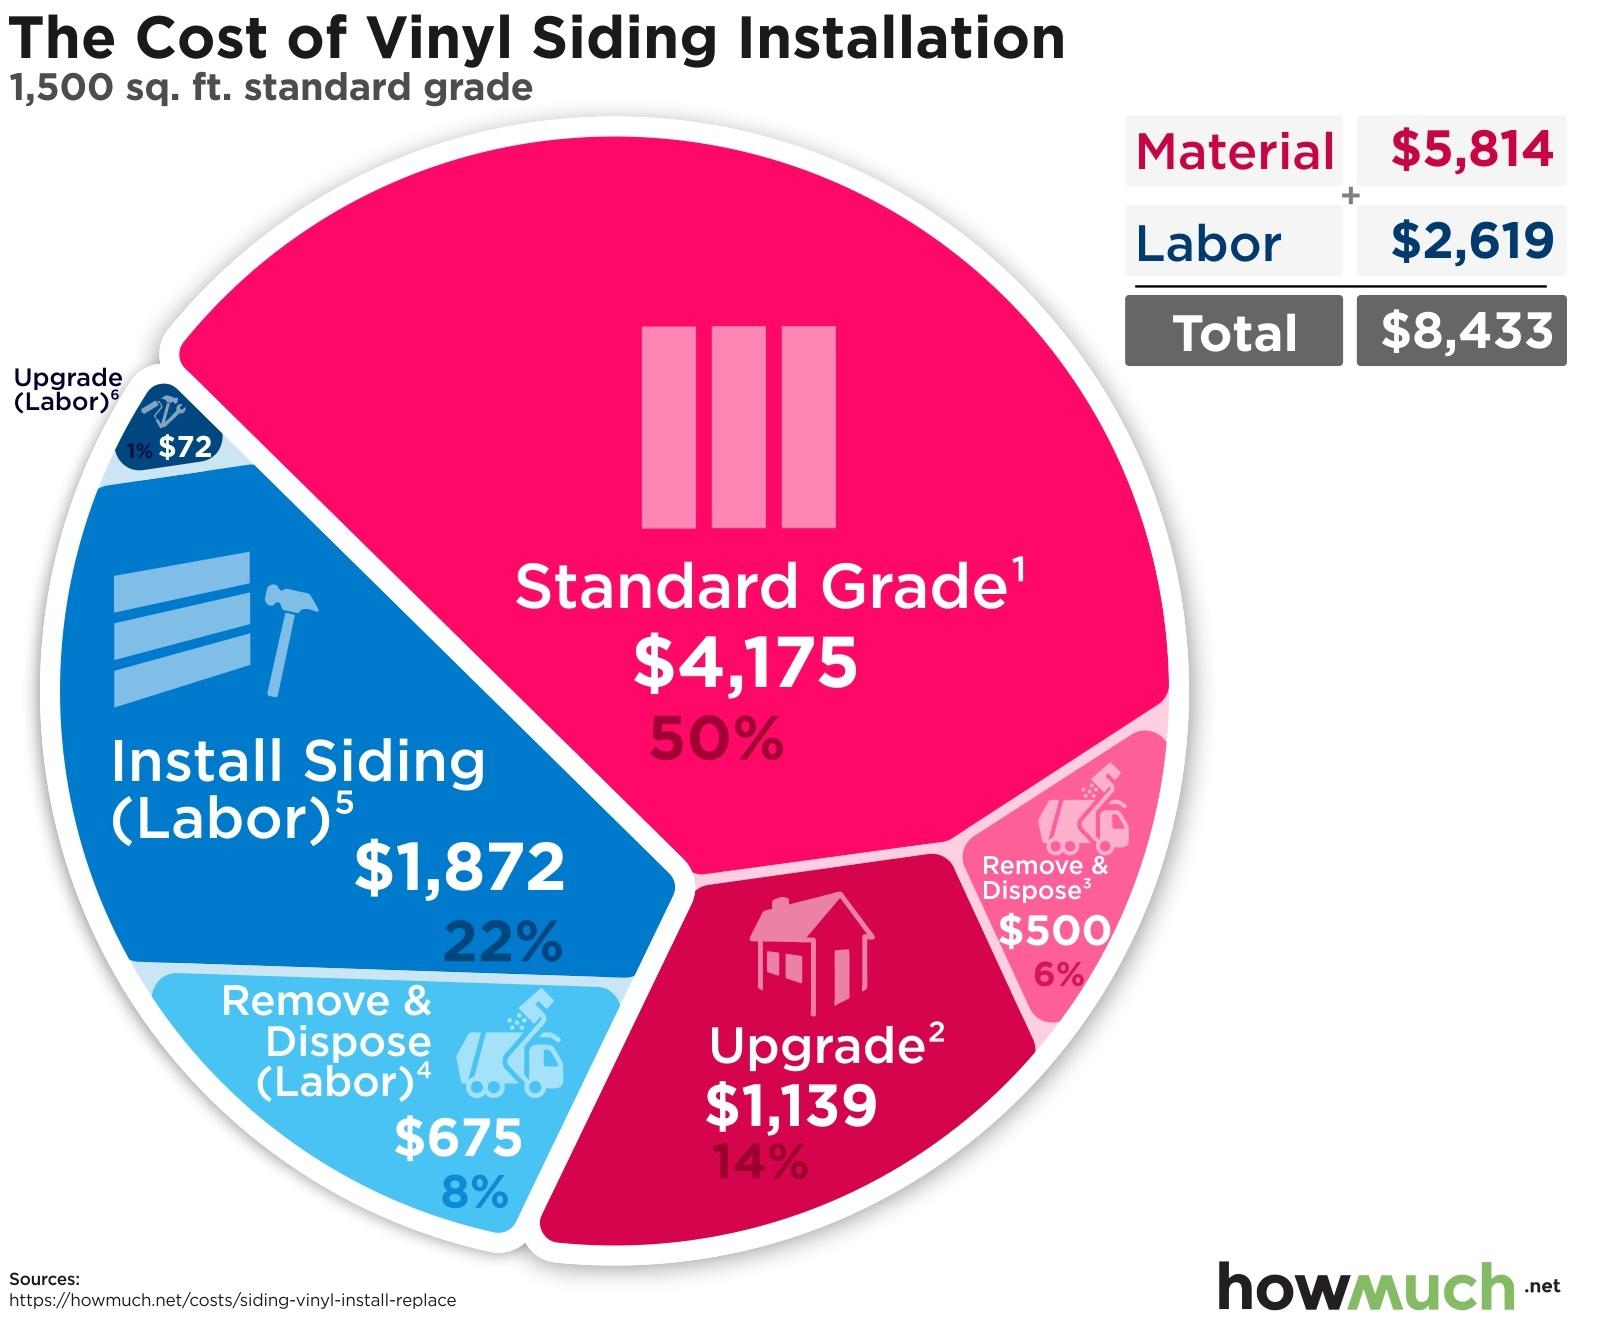 The Cost of Vinyl Siding Installation